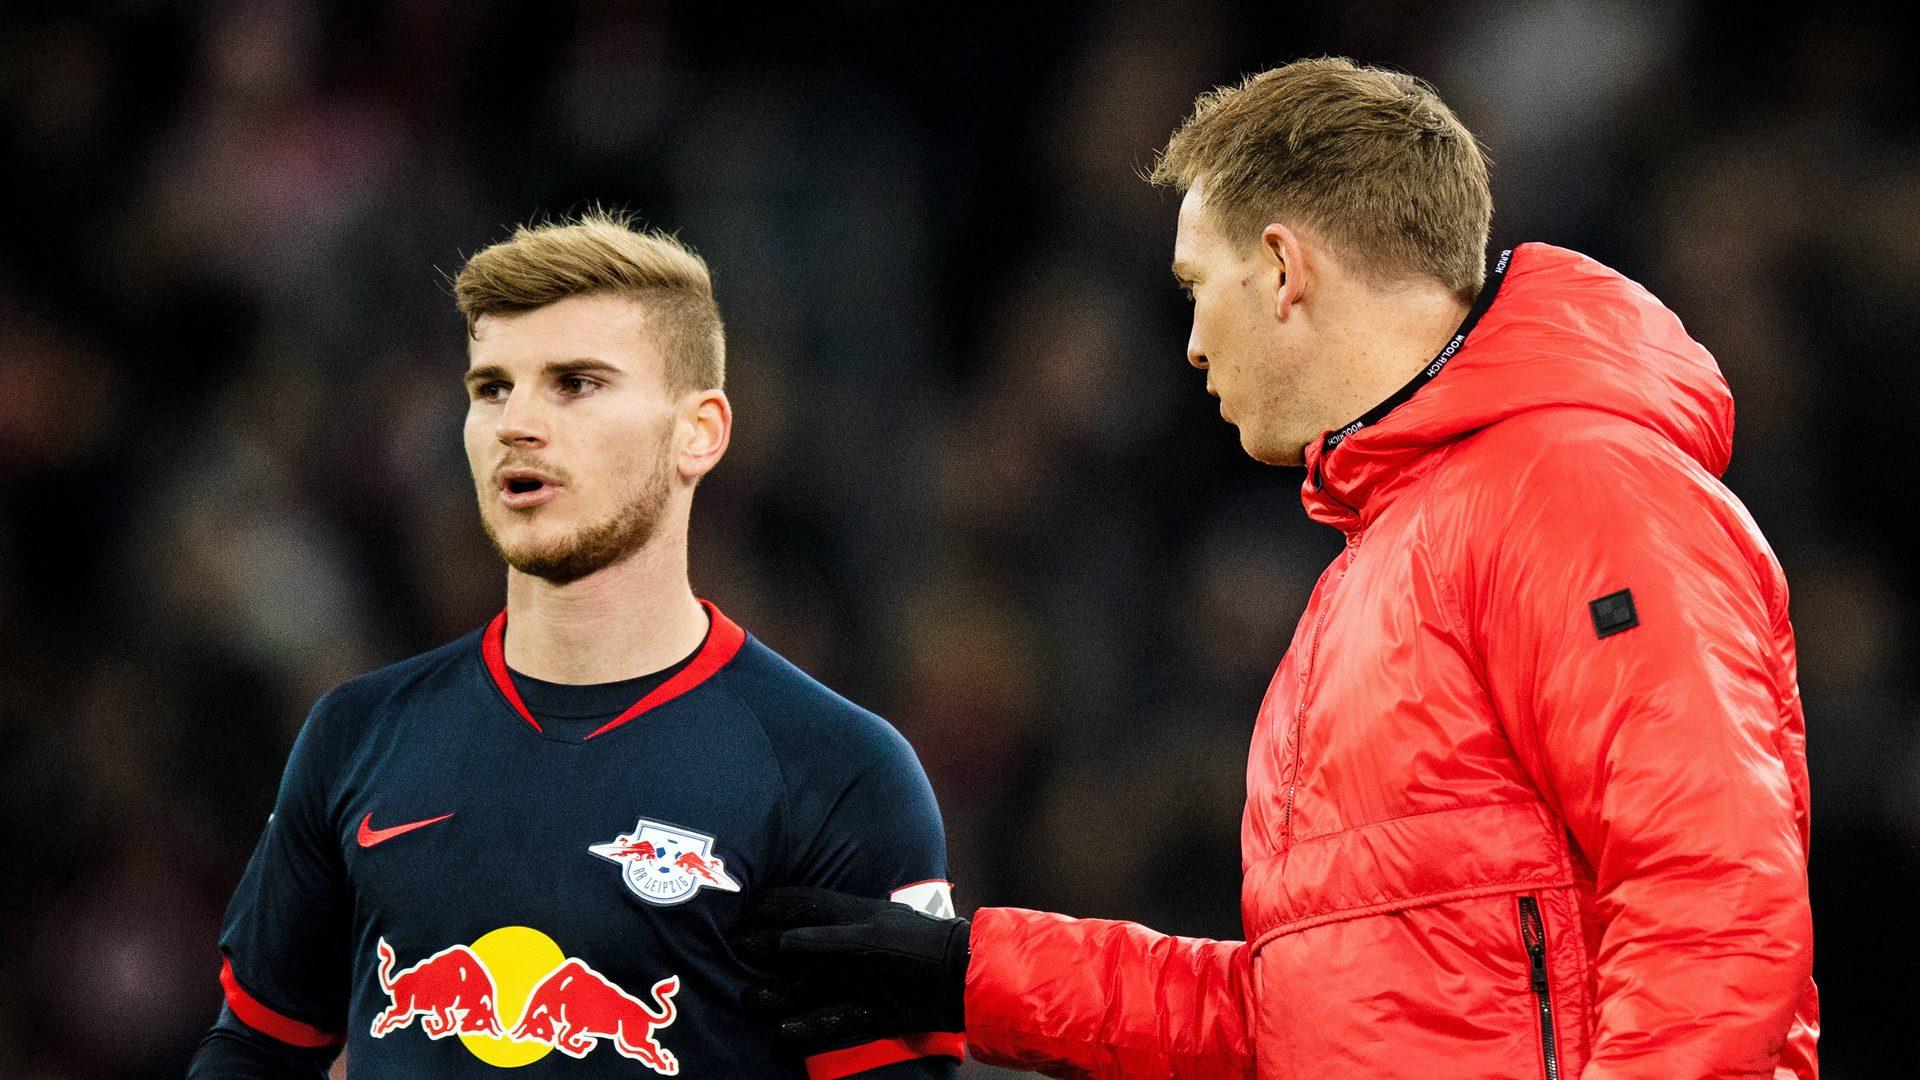 Bundesliga 5 Reasons Rb Leipzig Will Beat Tottenham Hotspur Again In The Champions League Last 16